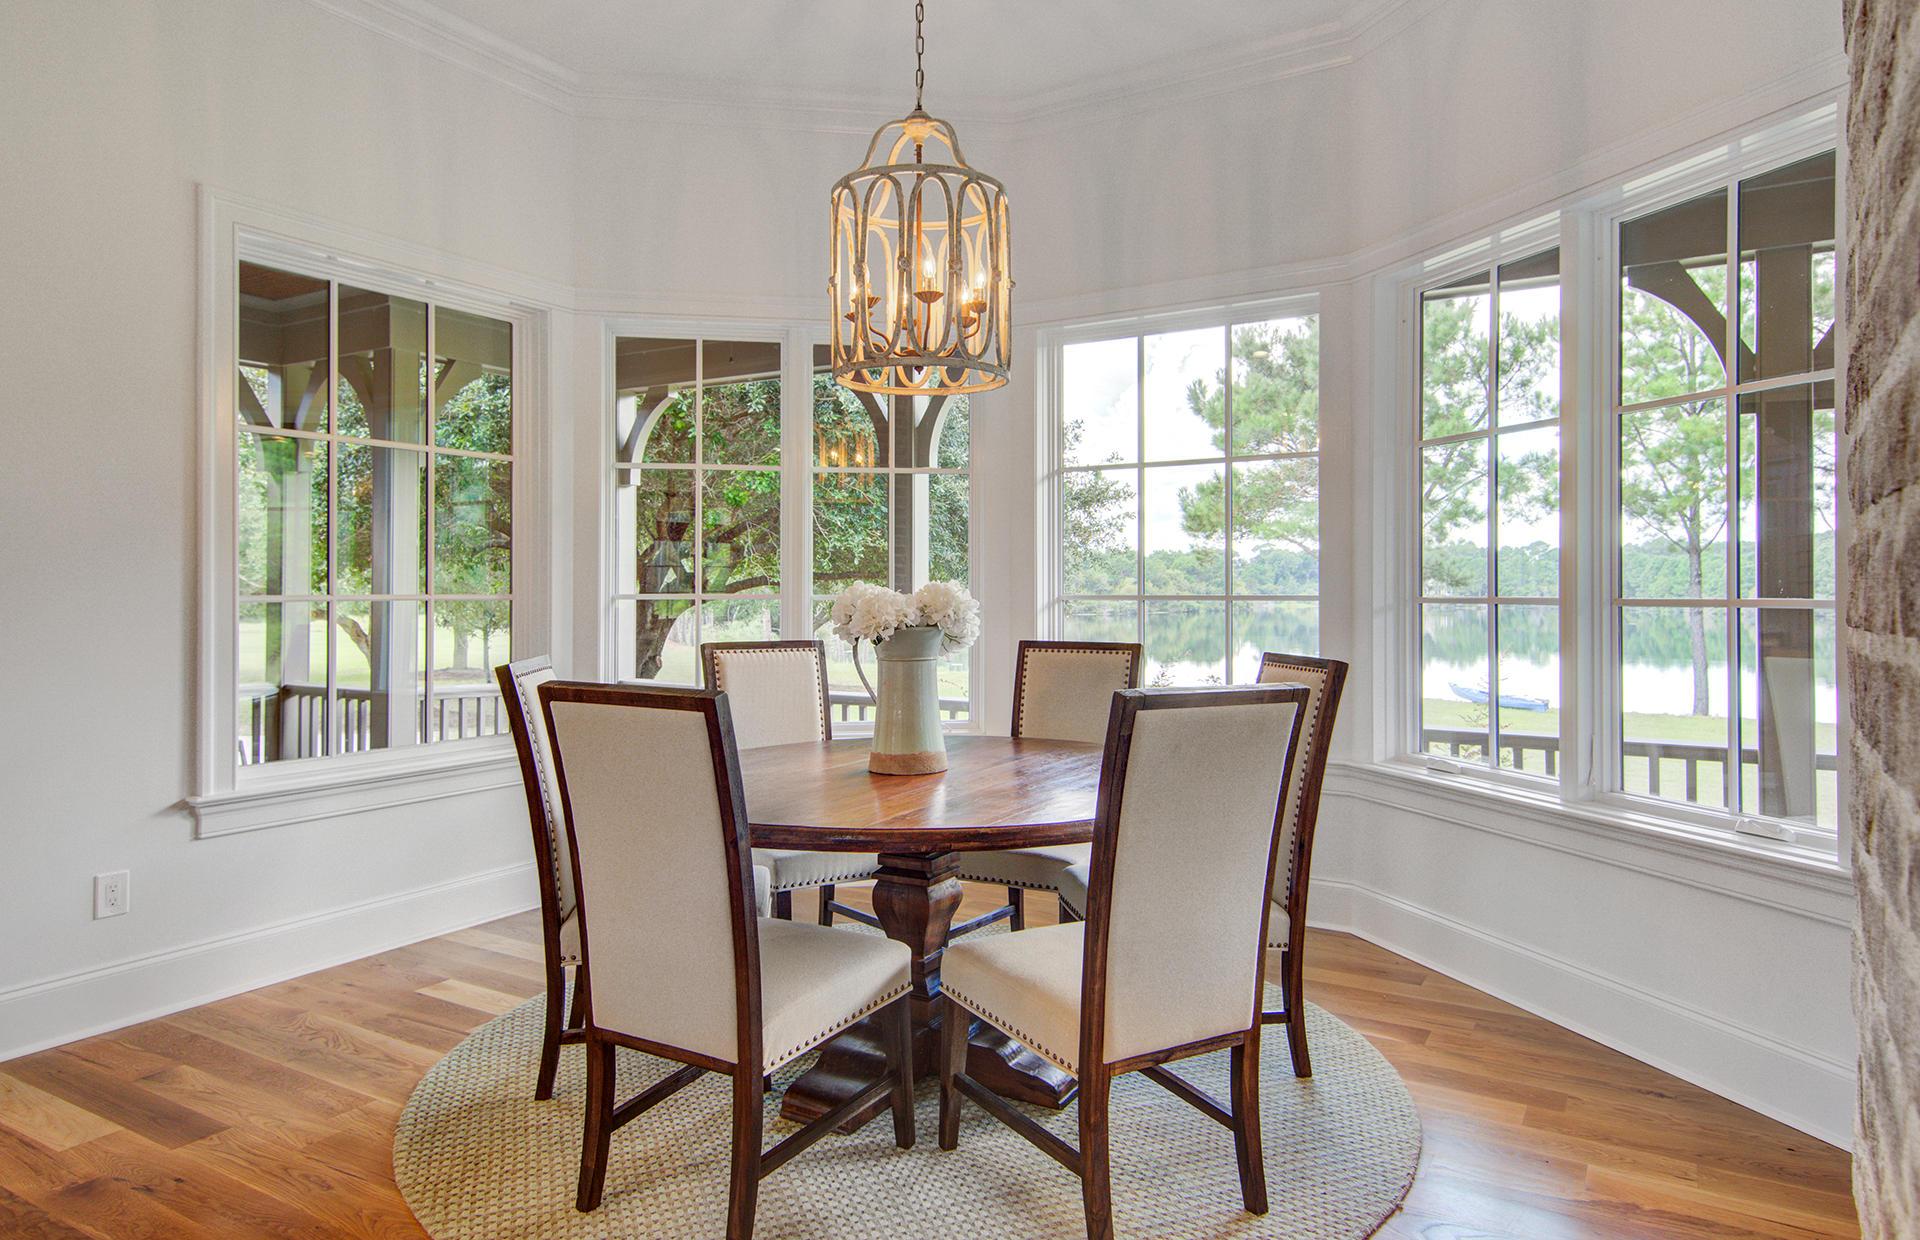 Briars Creek Homes For Sale - 3783 Gnarled Oaks, Johns Island, SC - 37